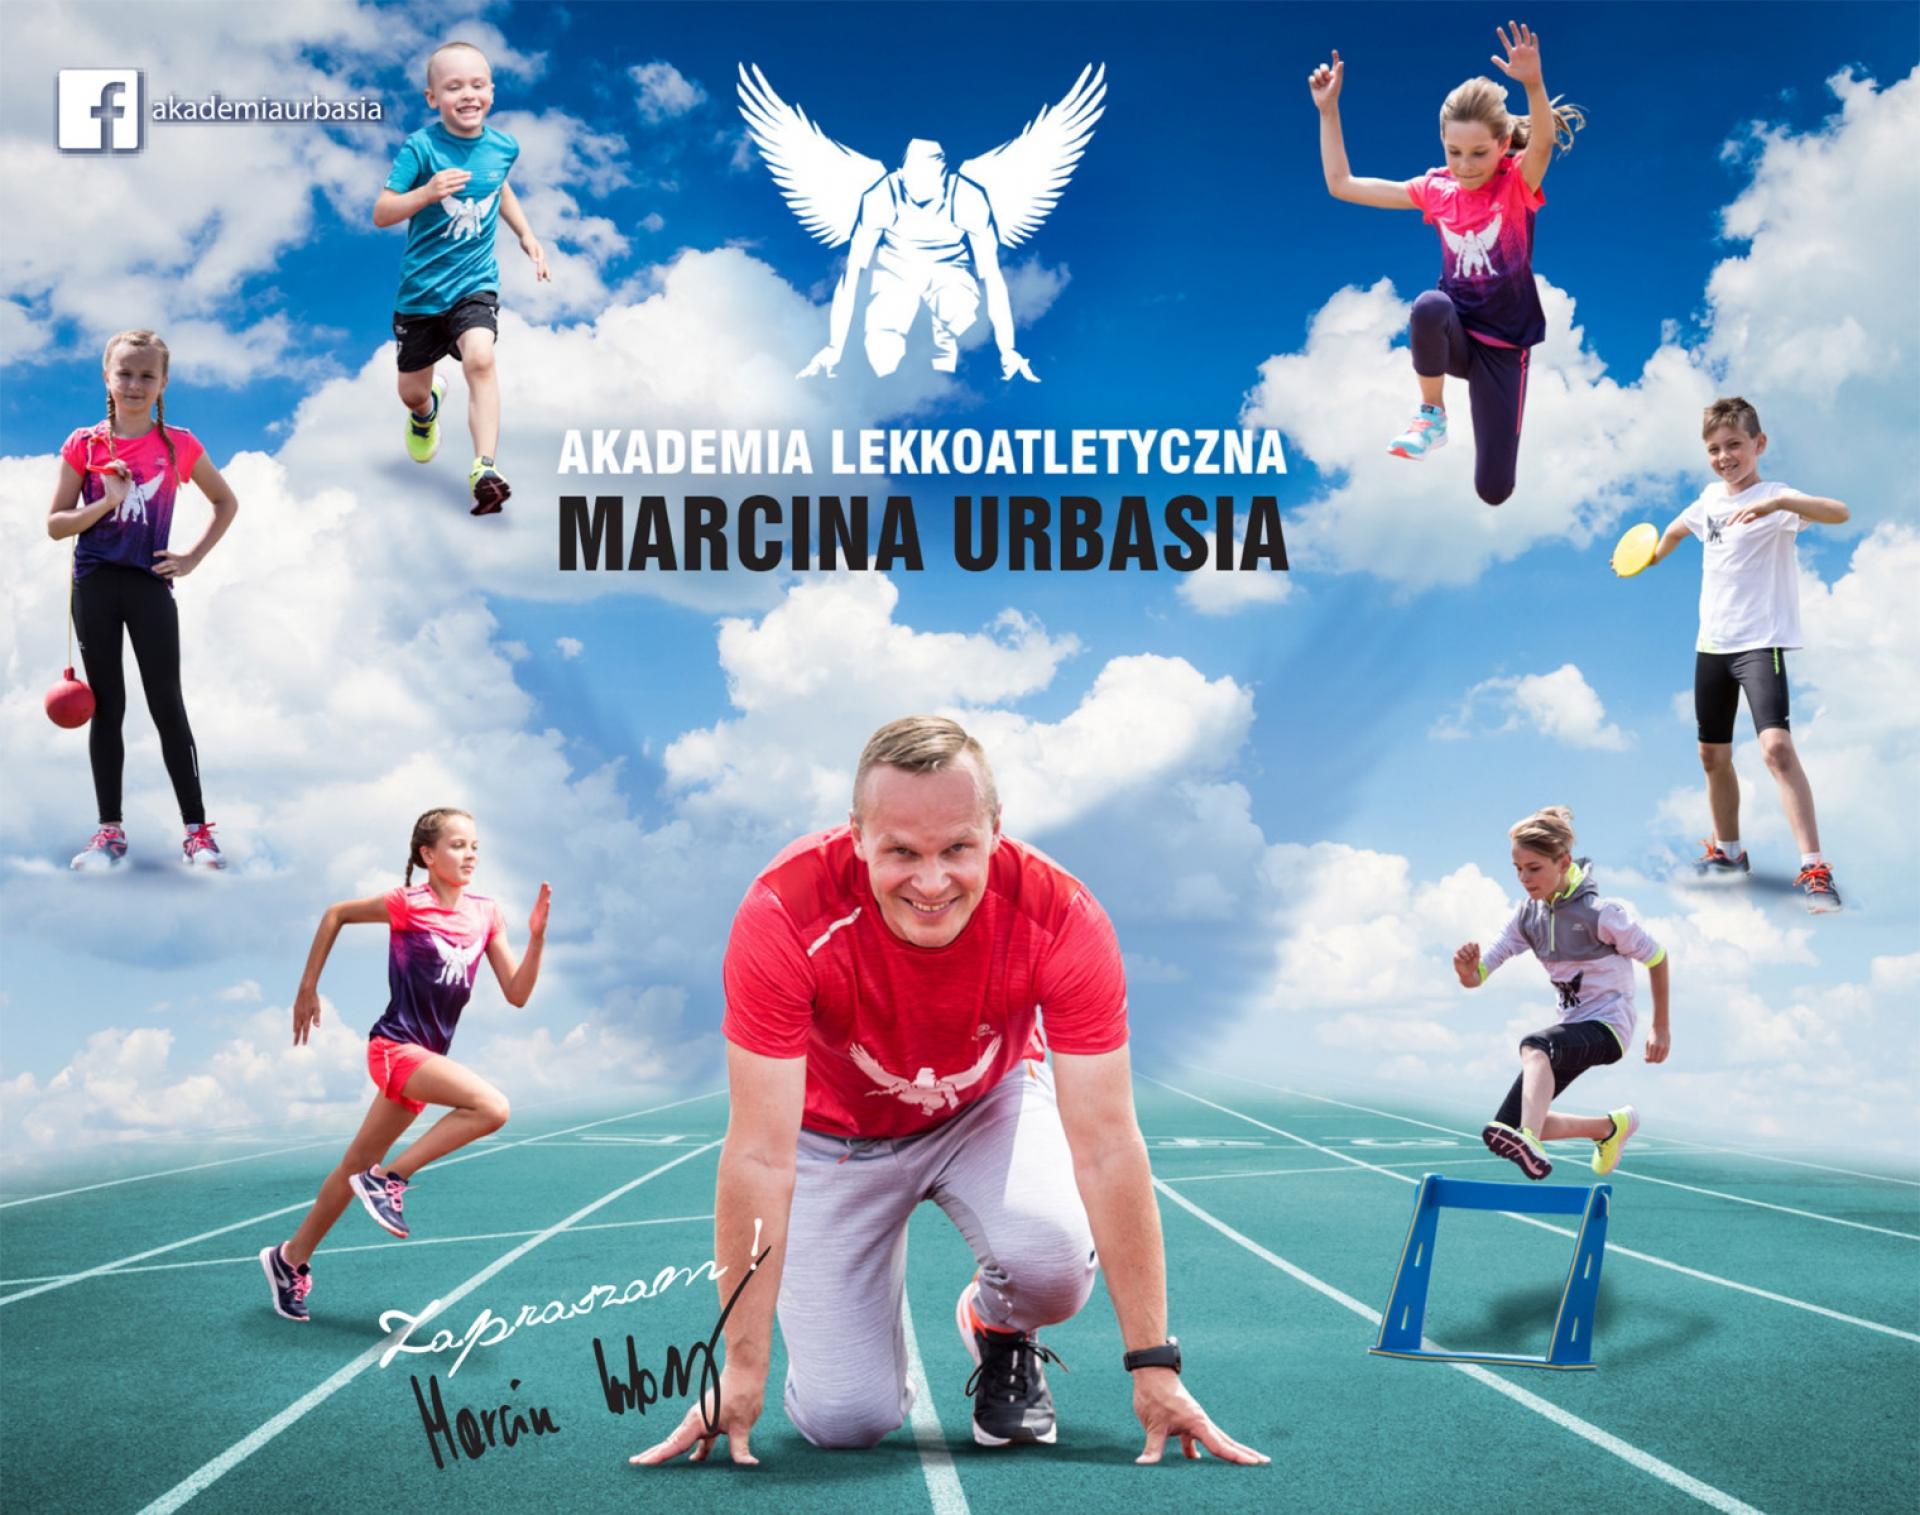 Akademia lekkoatletyczna Marcina Urbasia Legend.jpg